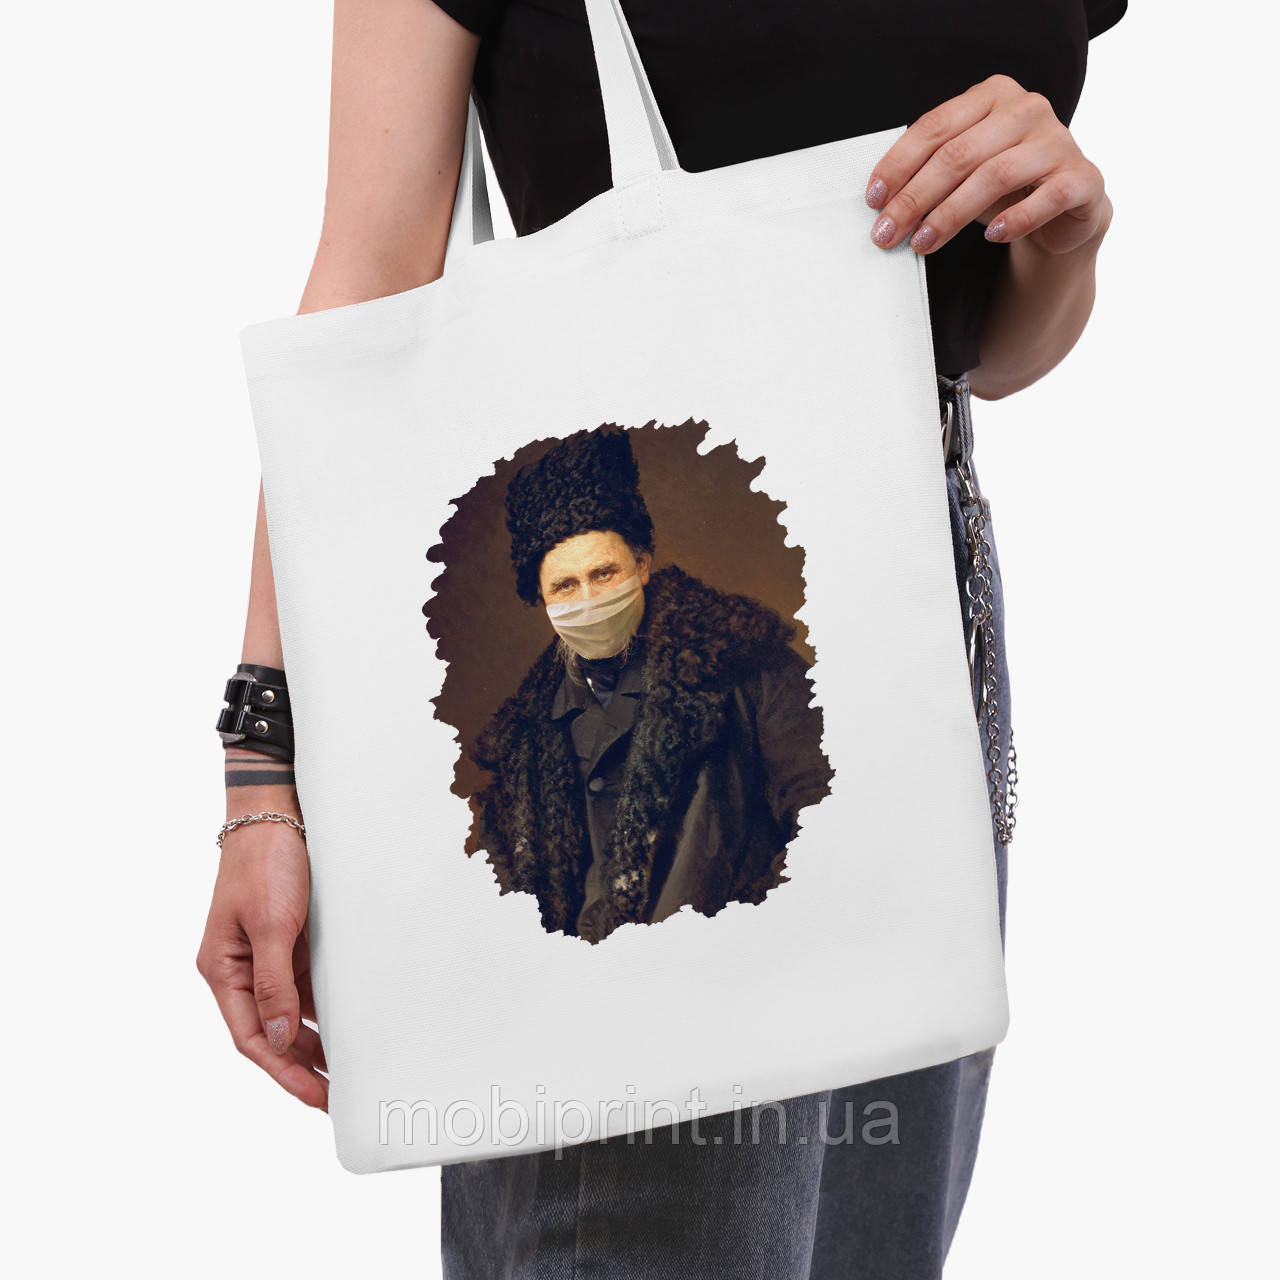 Еко сумка шоппер біла Тарас Шевченко (Taras Shevchenko) (9227-1427-3) 41*35 см